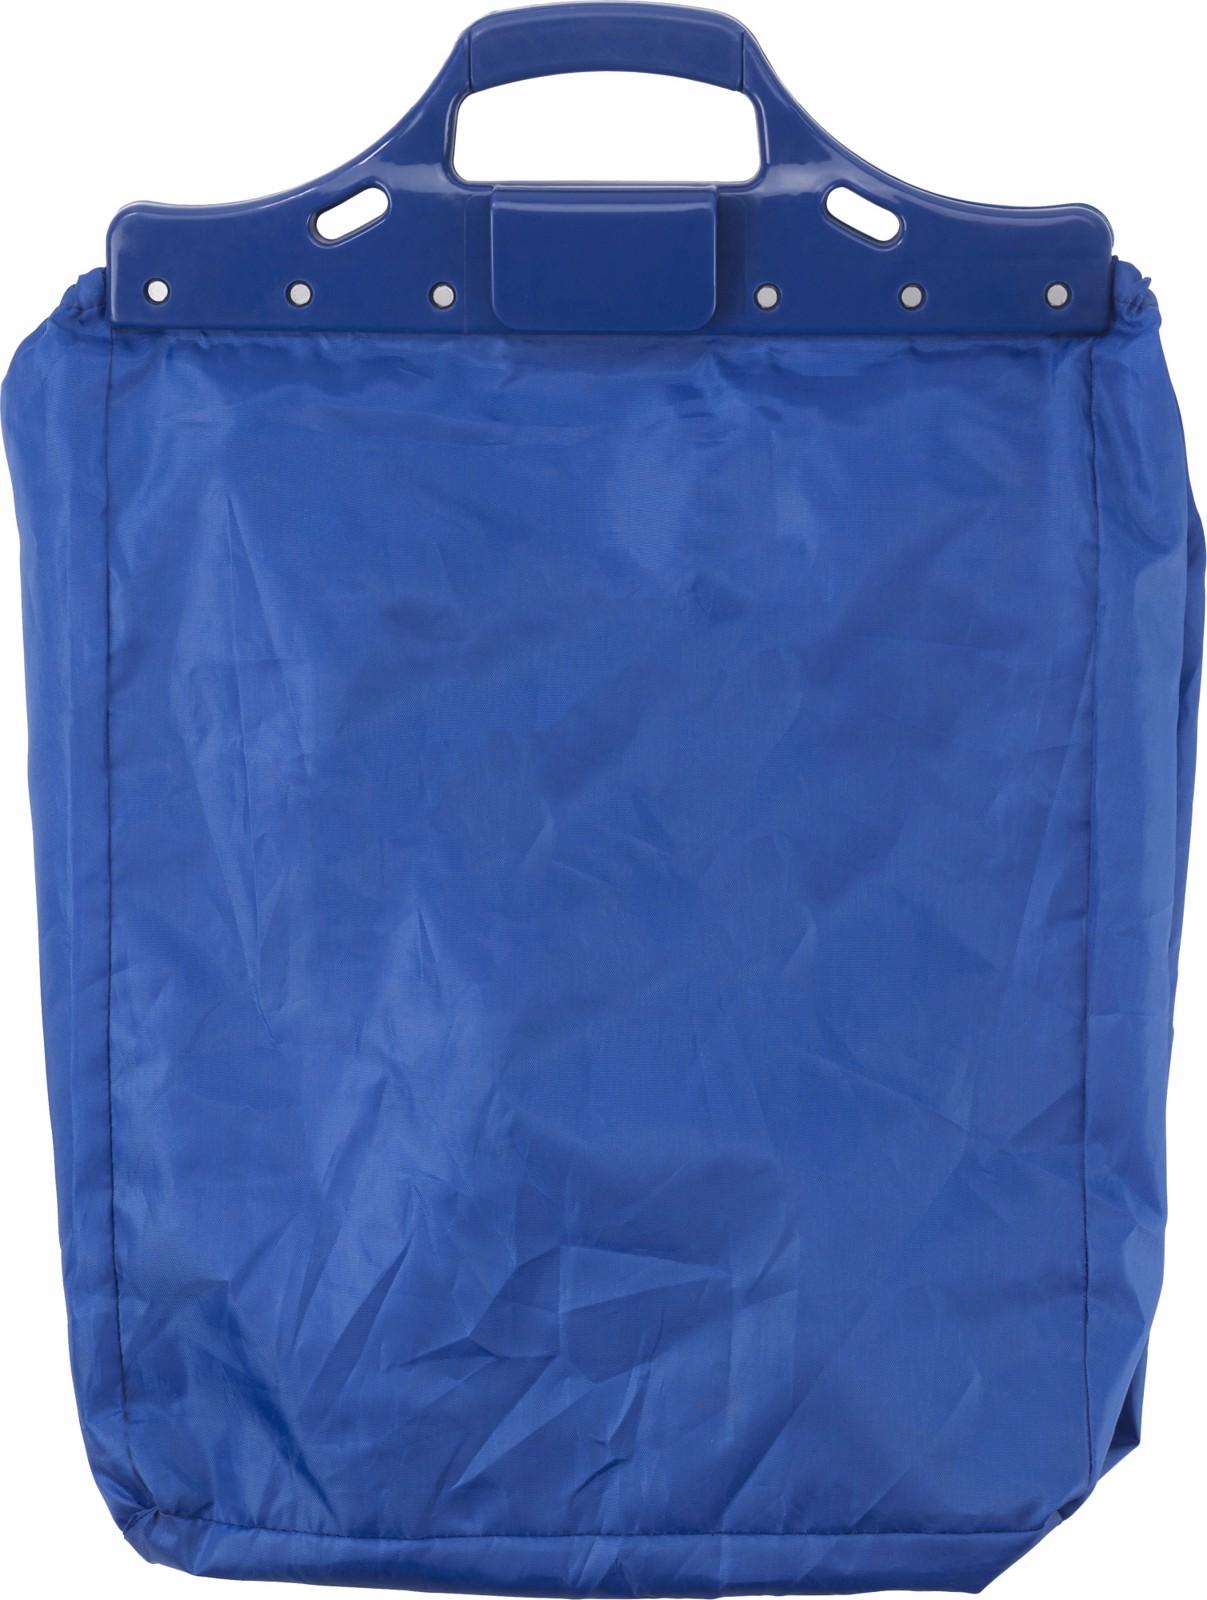 Polyester (210D) trolley shopping bag - Cobalt Blue